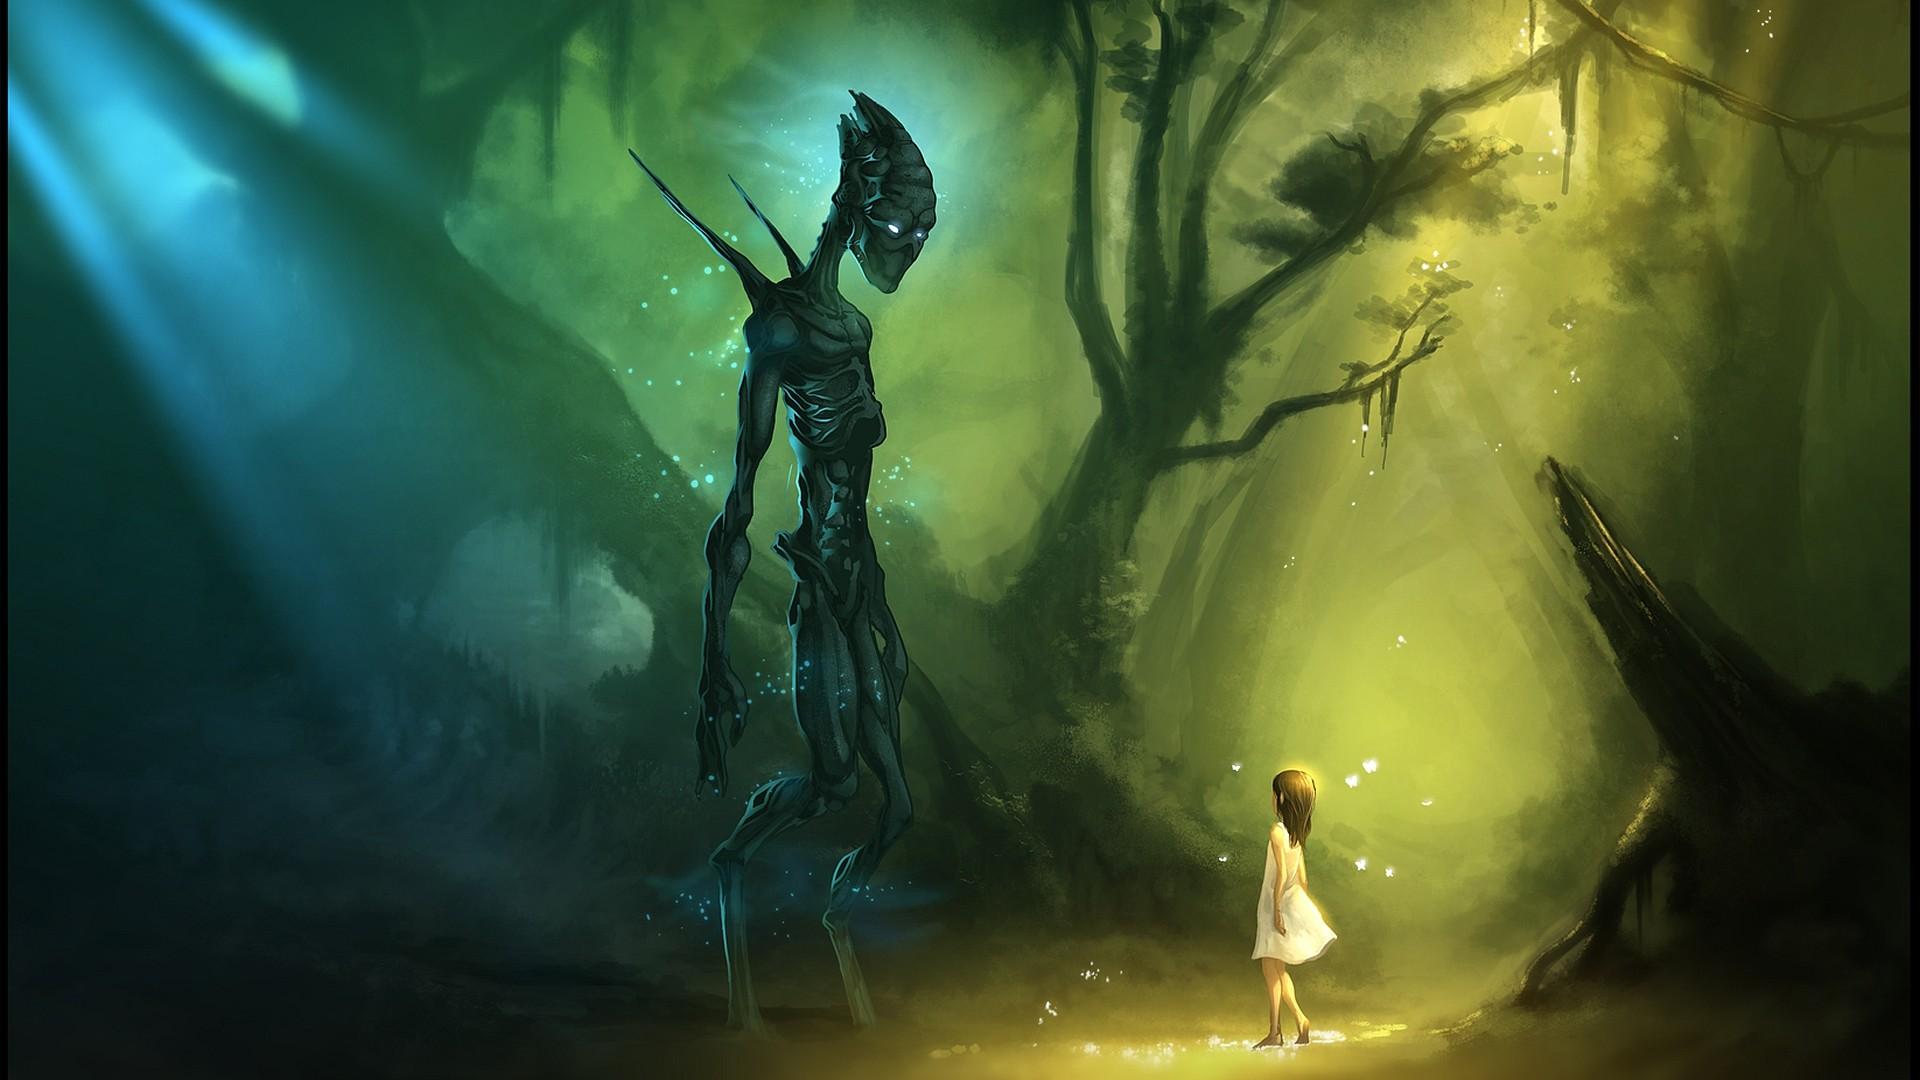 ☺iphone ios 7 wallpaper tumblr for ipad. Alien GirlScience Fiction …